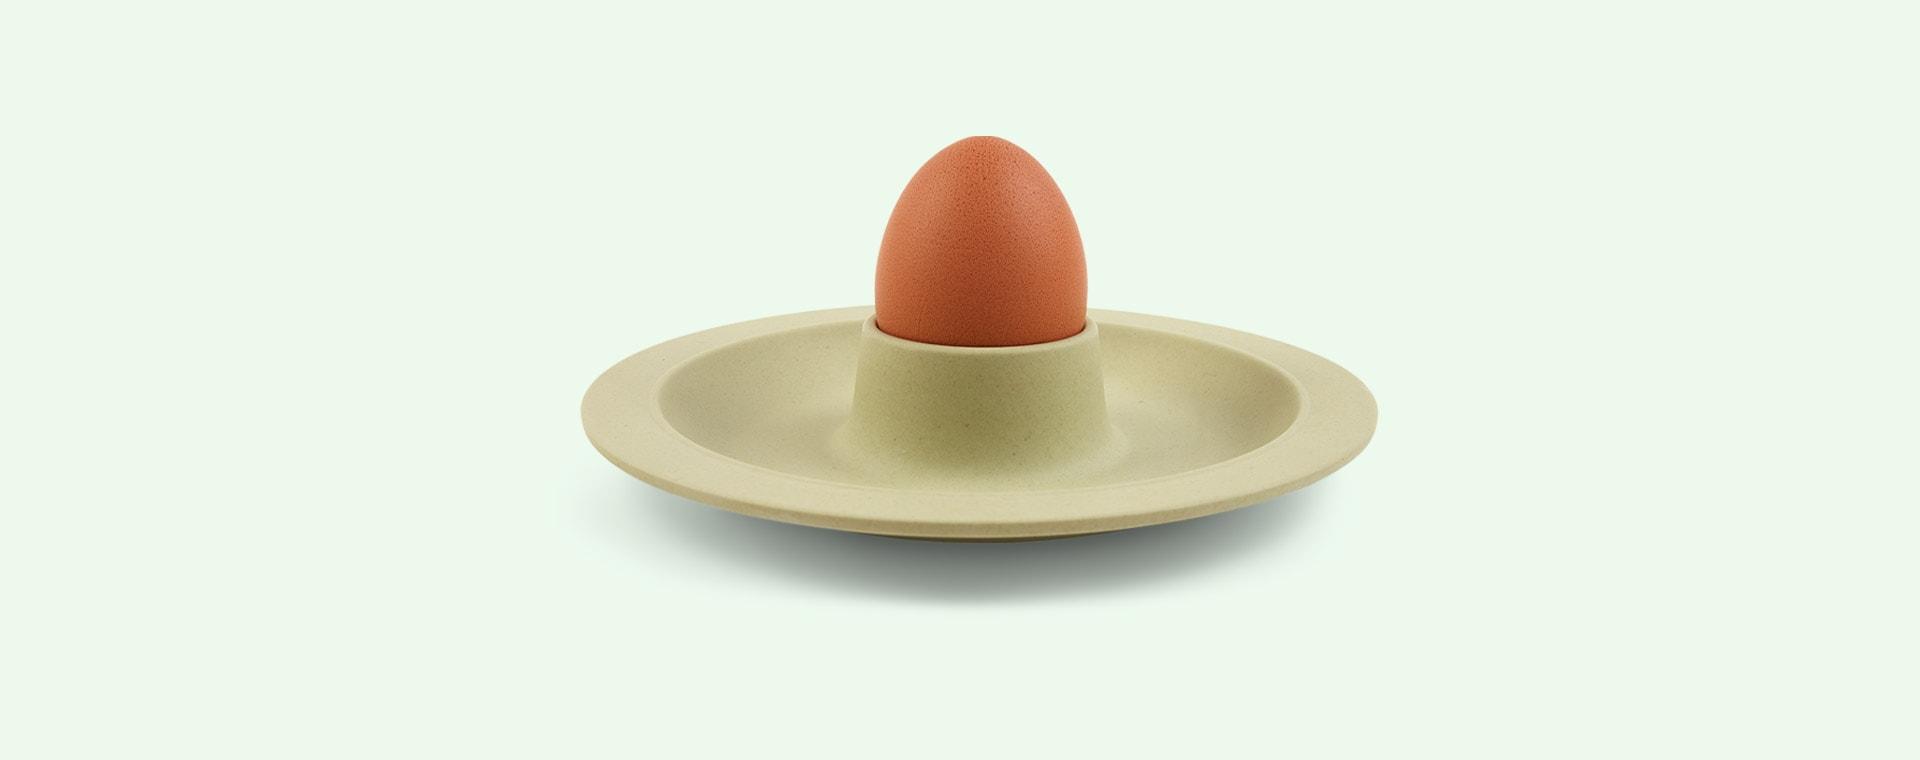 Green Zuperzozial Dippy Egg Plate